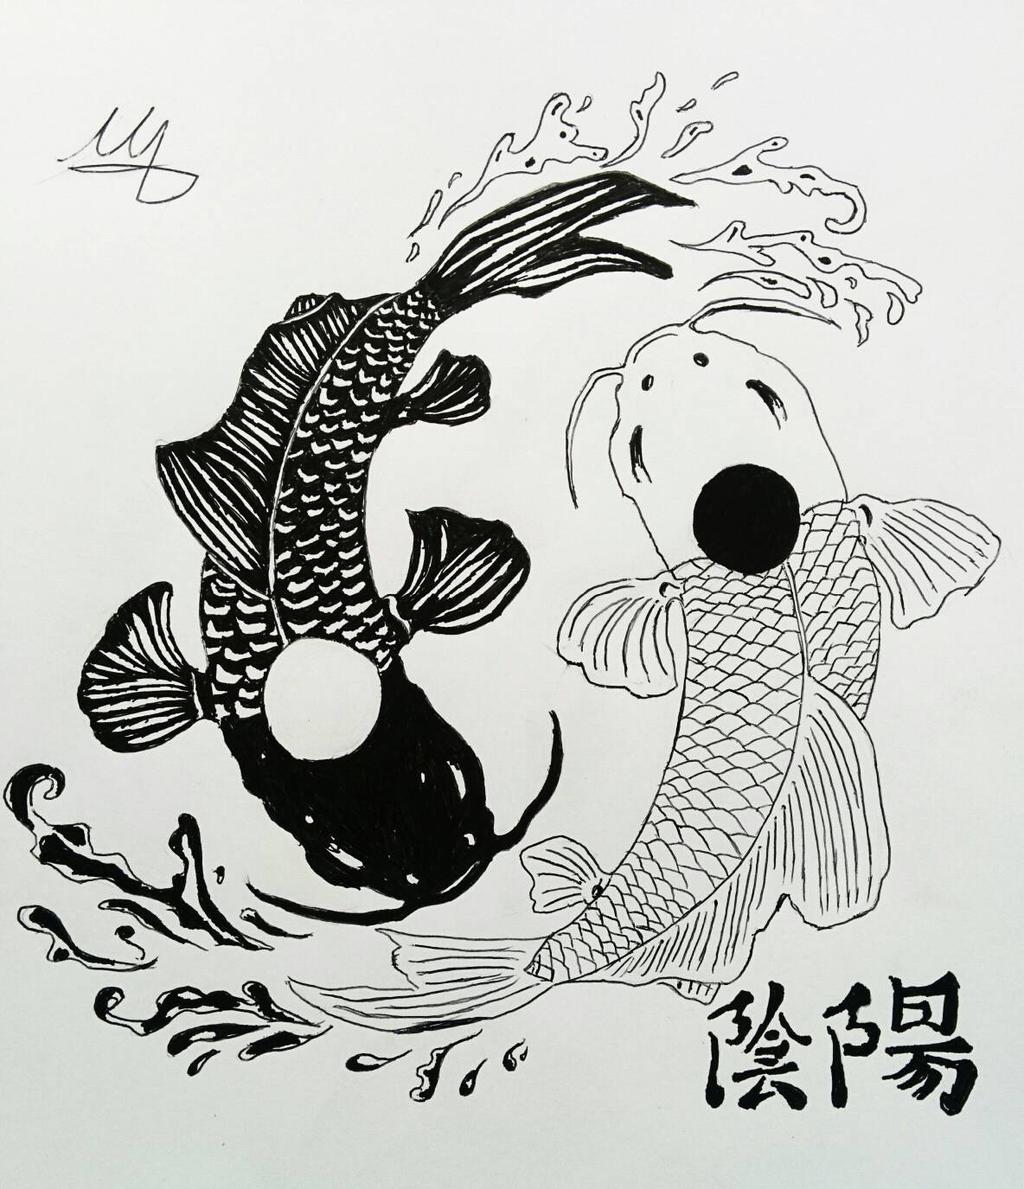 yin yang koi fish by martynes9n on deviantart. Black Bedroom Furniture Sets. Home Design Ideas